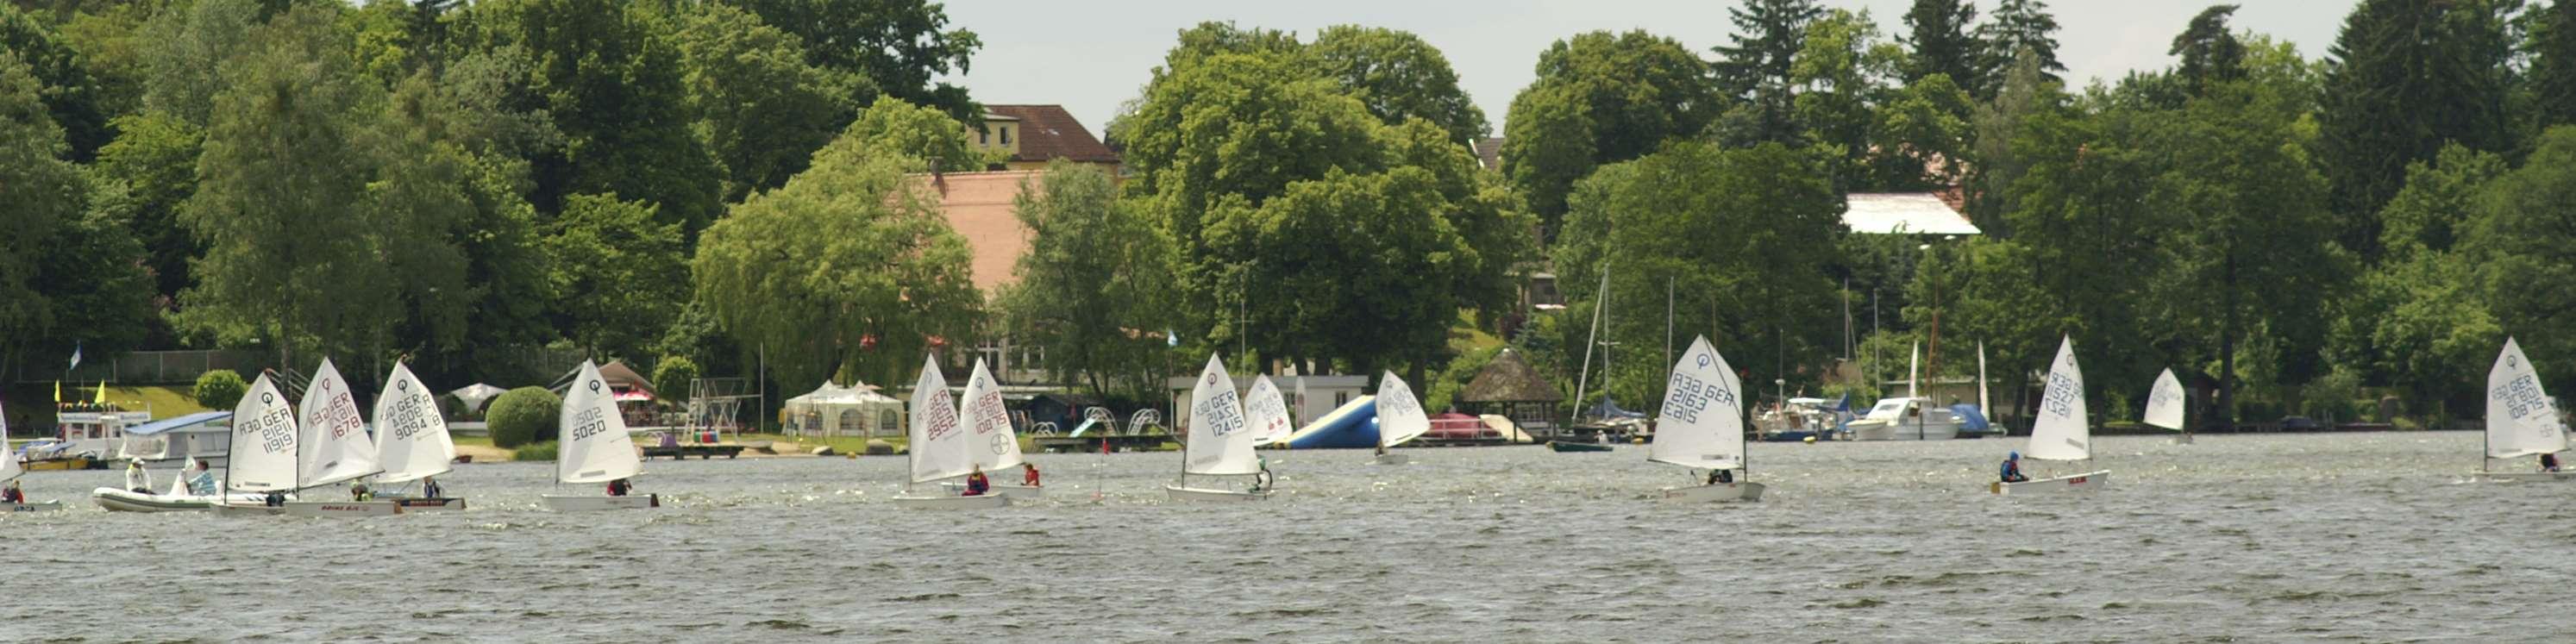 regatta3.jpg